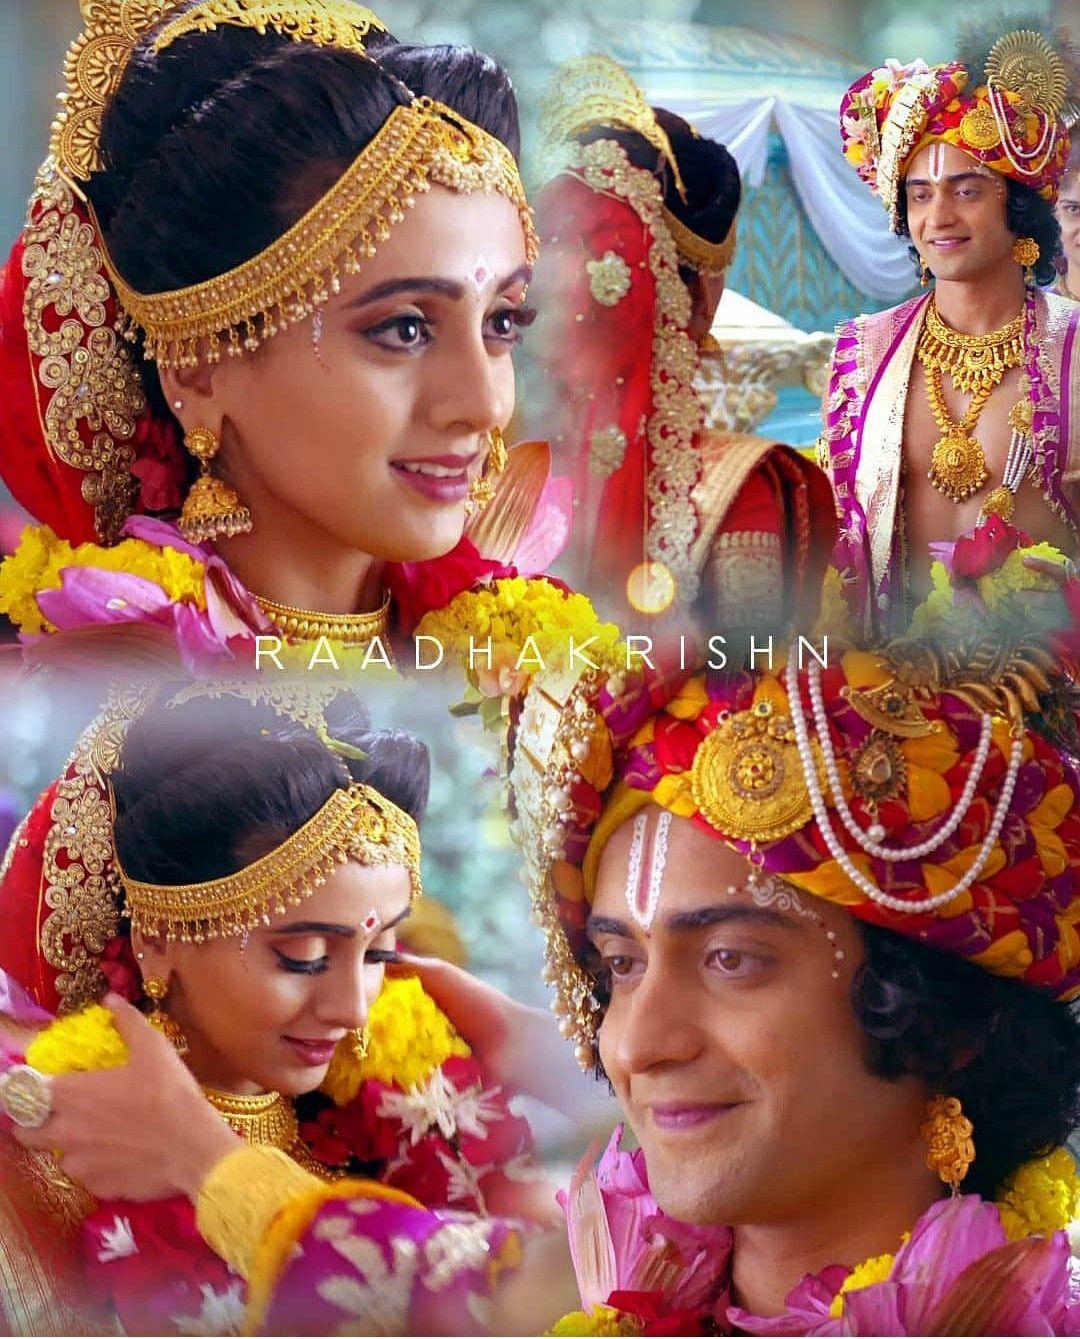 Pin By Navreet Lyallpuri On Rukmini Zalakdesai In 2020 Gujrati Wedding Bride Portrait Pooja Sharma